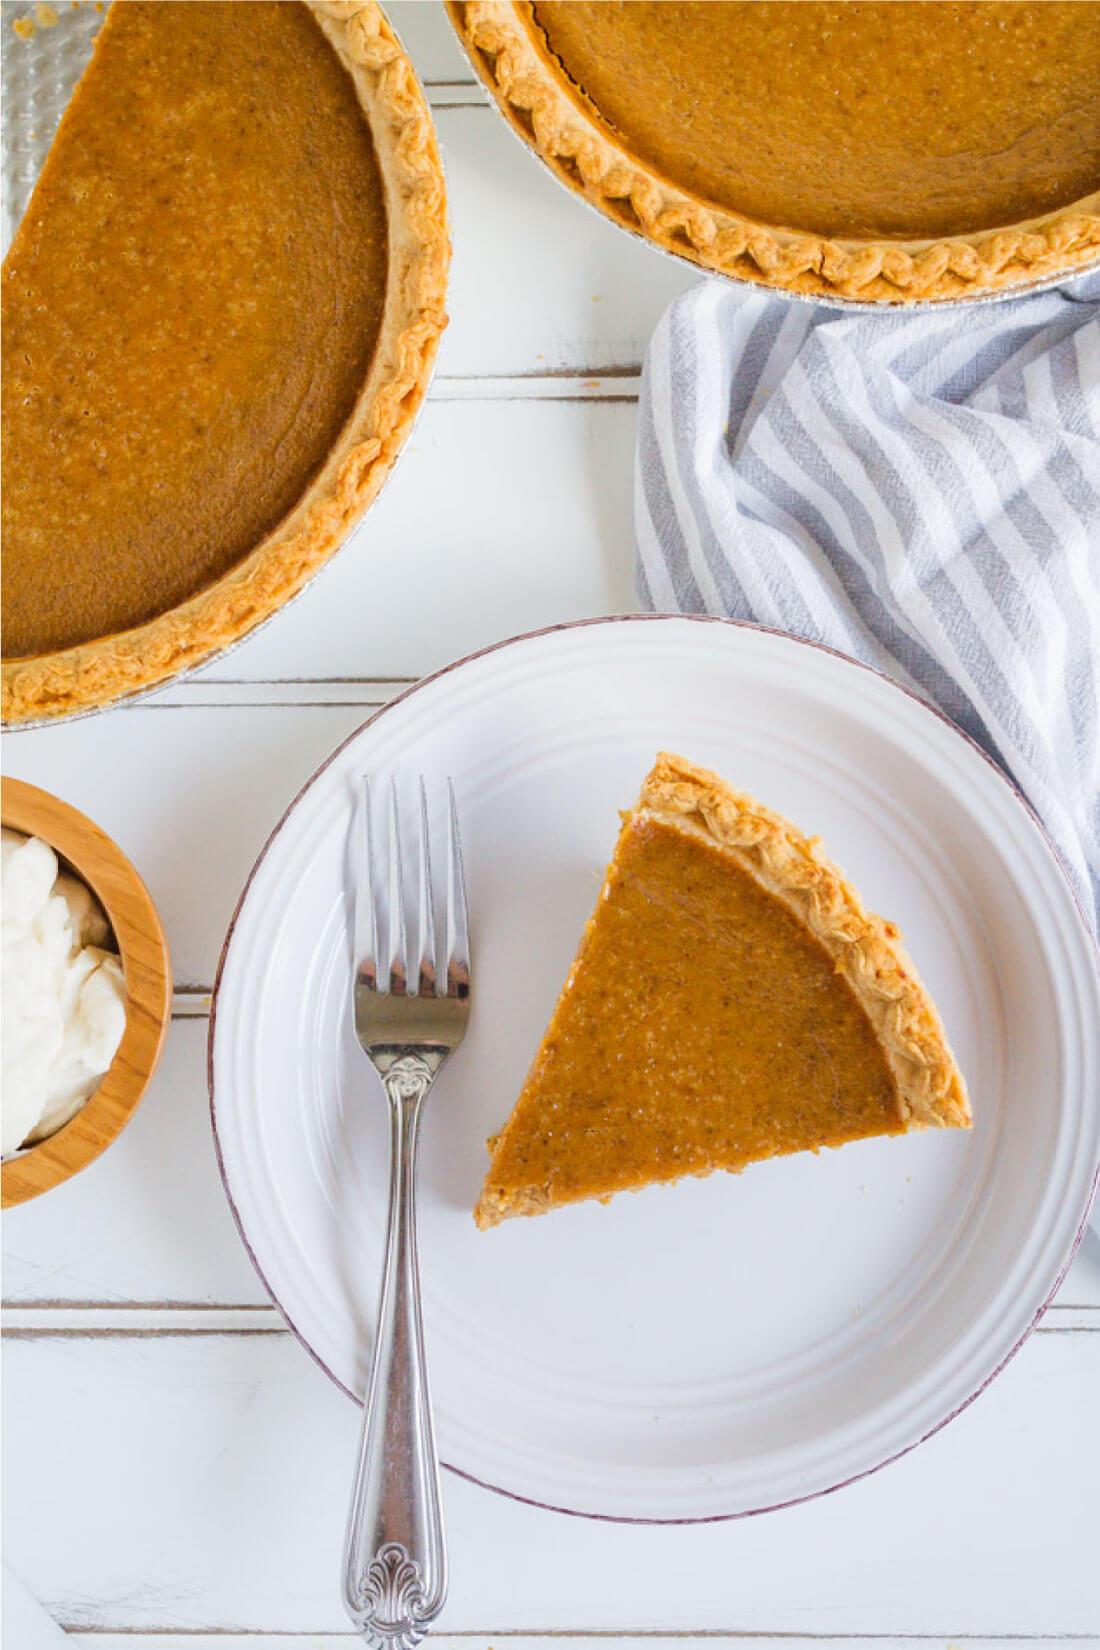 Simple, classic Pumpkin Pie recipe that you will love!! And it has homemade whipped cream to boot. via www.thirtyhandmadedays.com